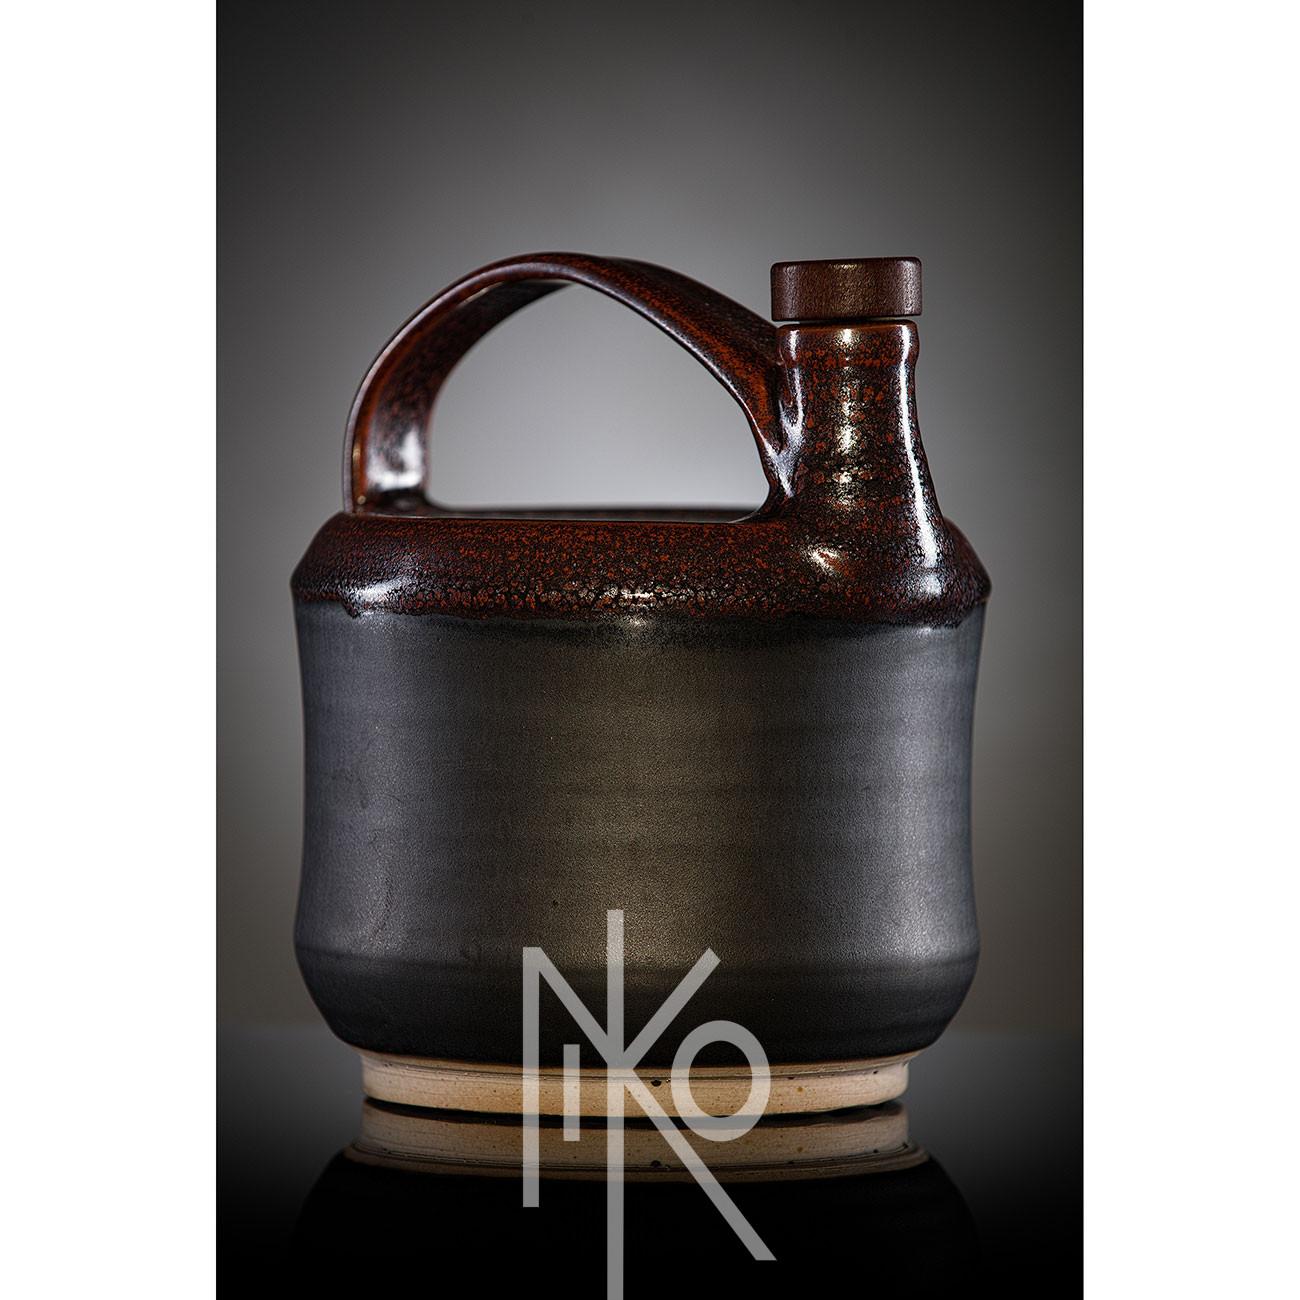 Ceramics by Niko Yulis